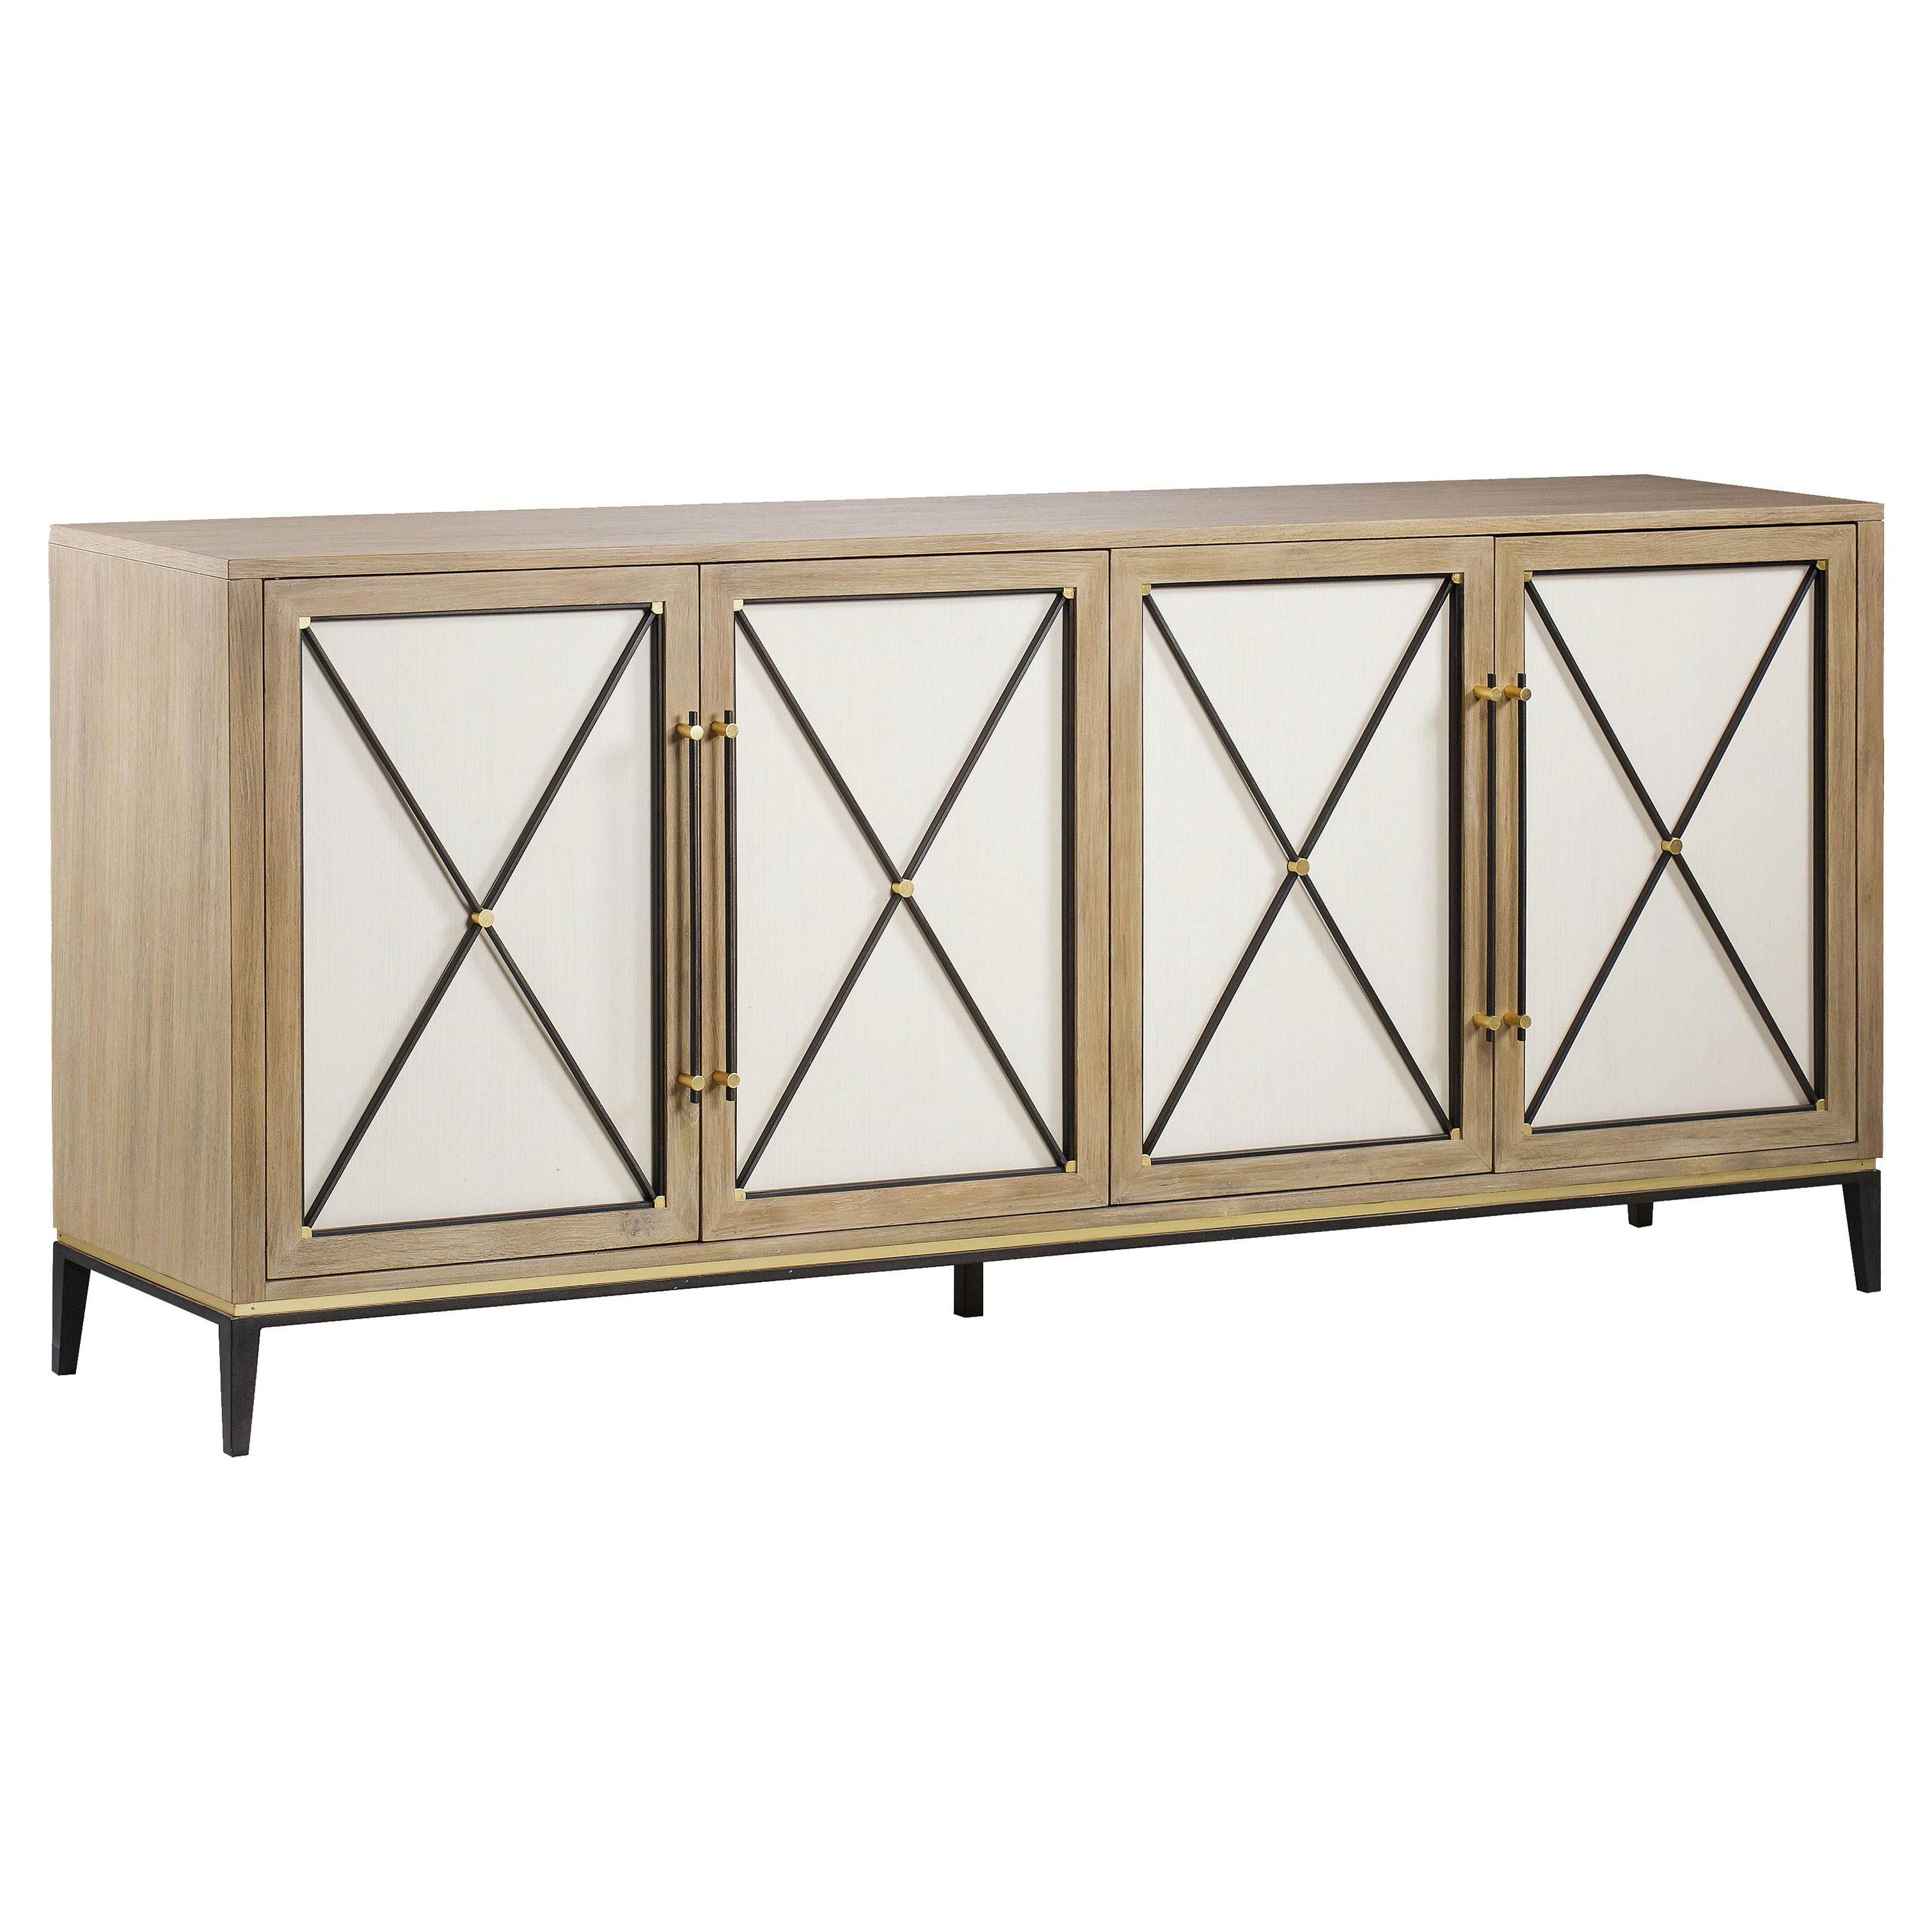 Carson Credenza Modern Oak 4 White Door Buffet Sideboard With Ethelinda Media Credenzas (View 5 of 20)